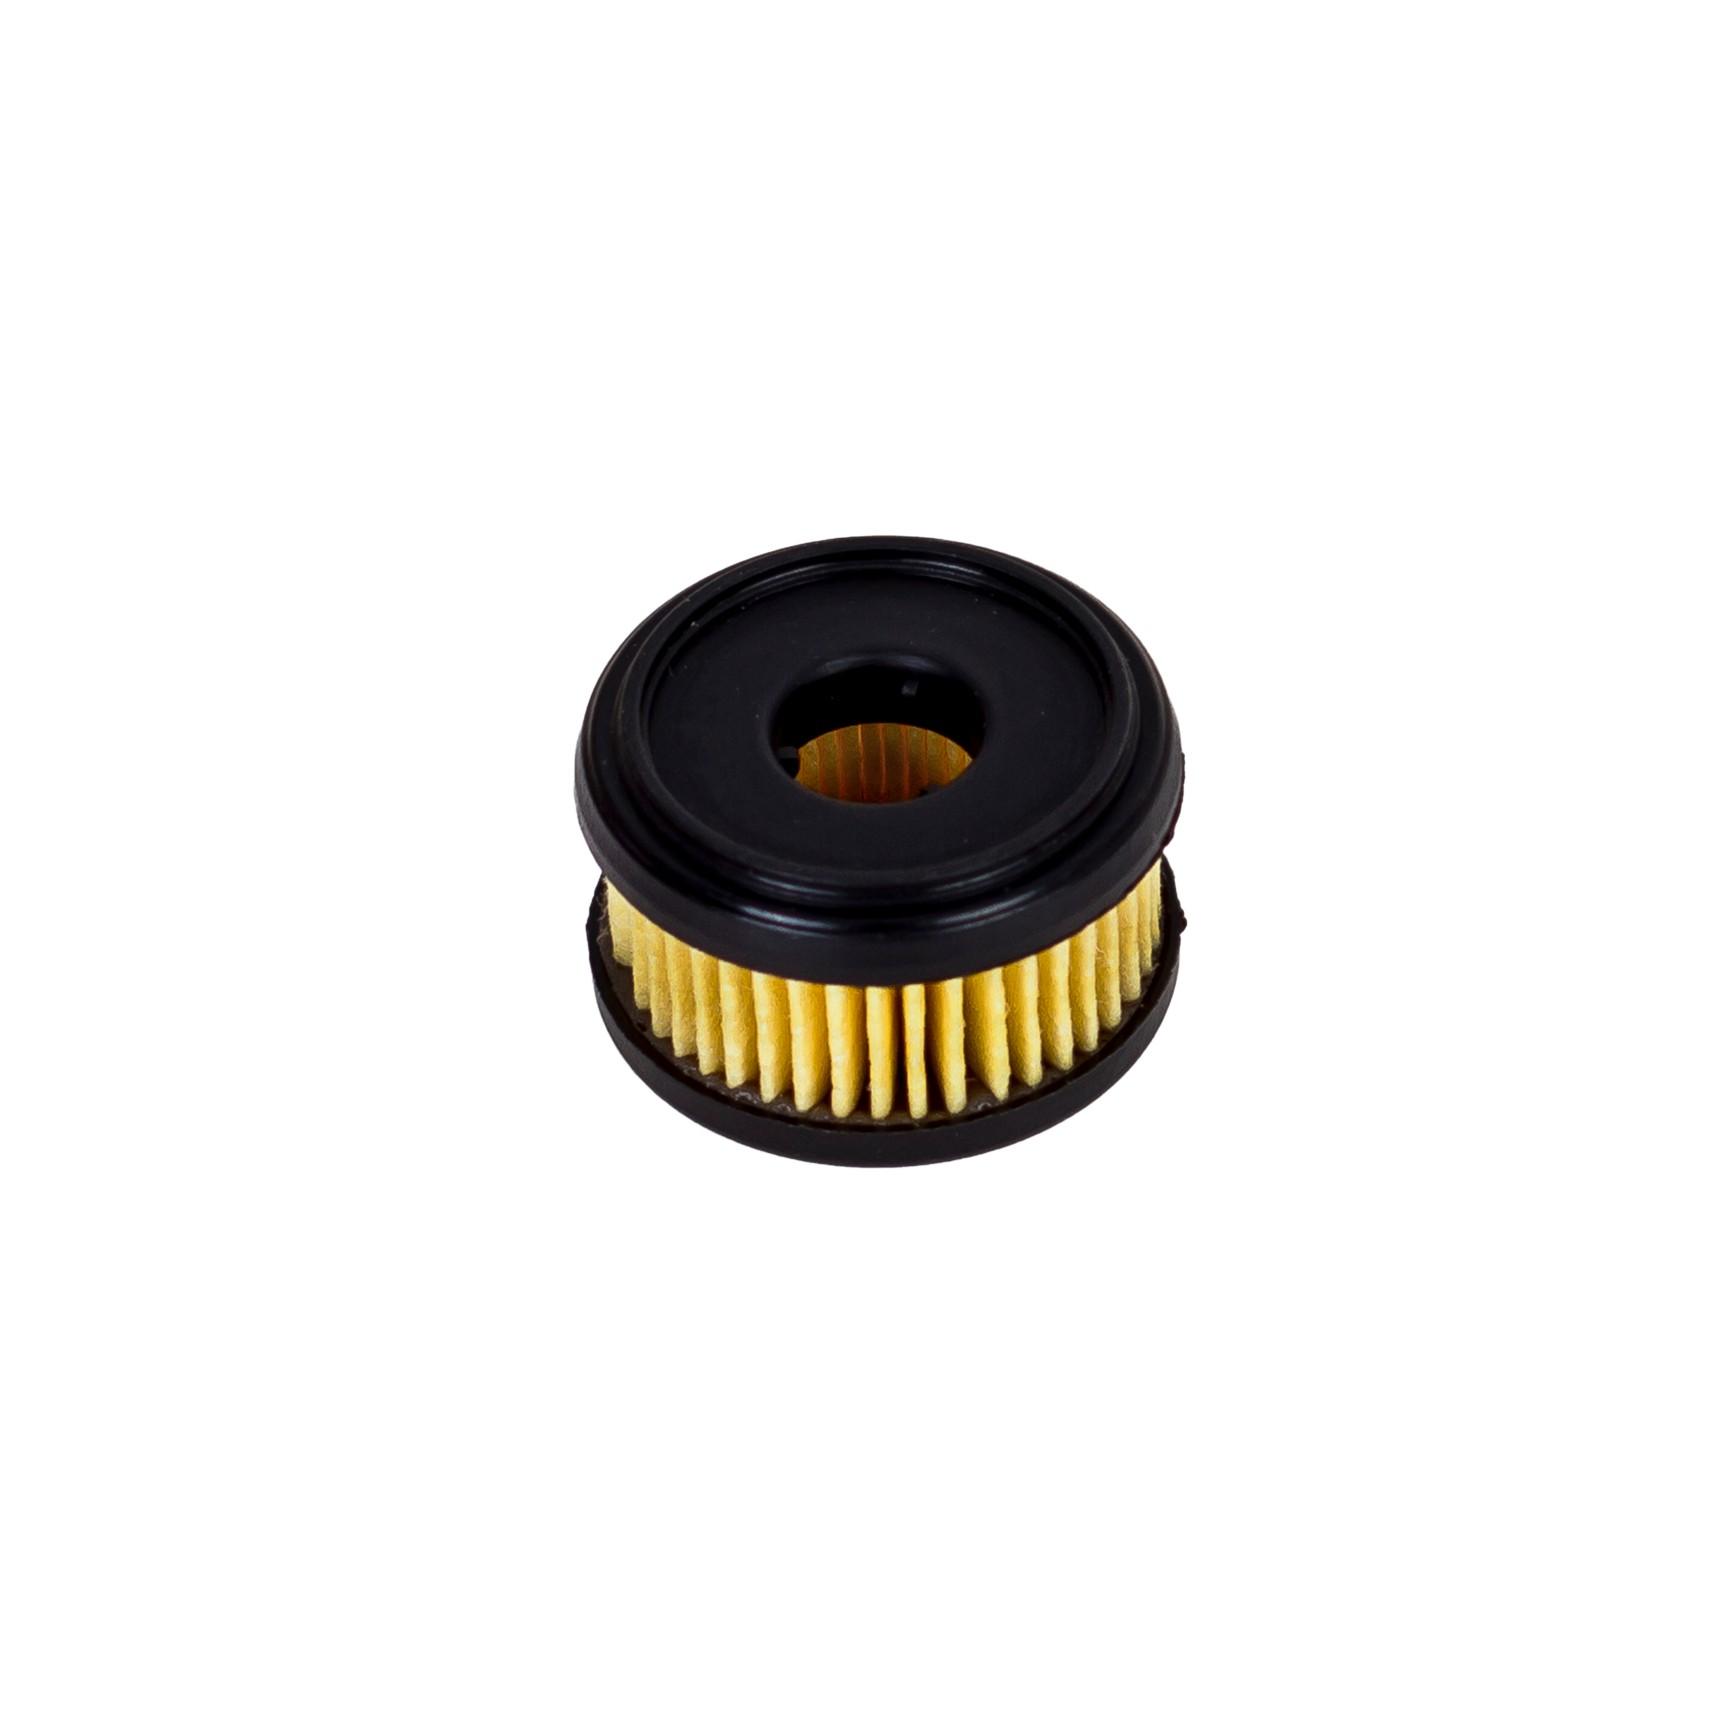 Accessories - Filter cartridge